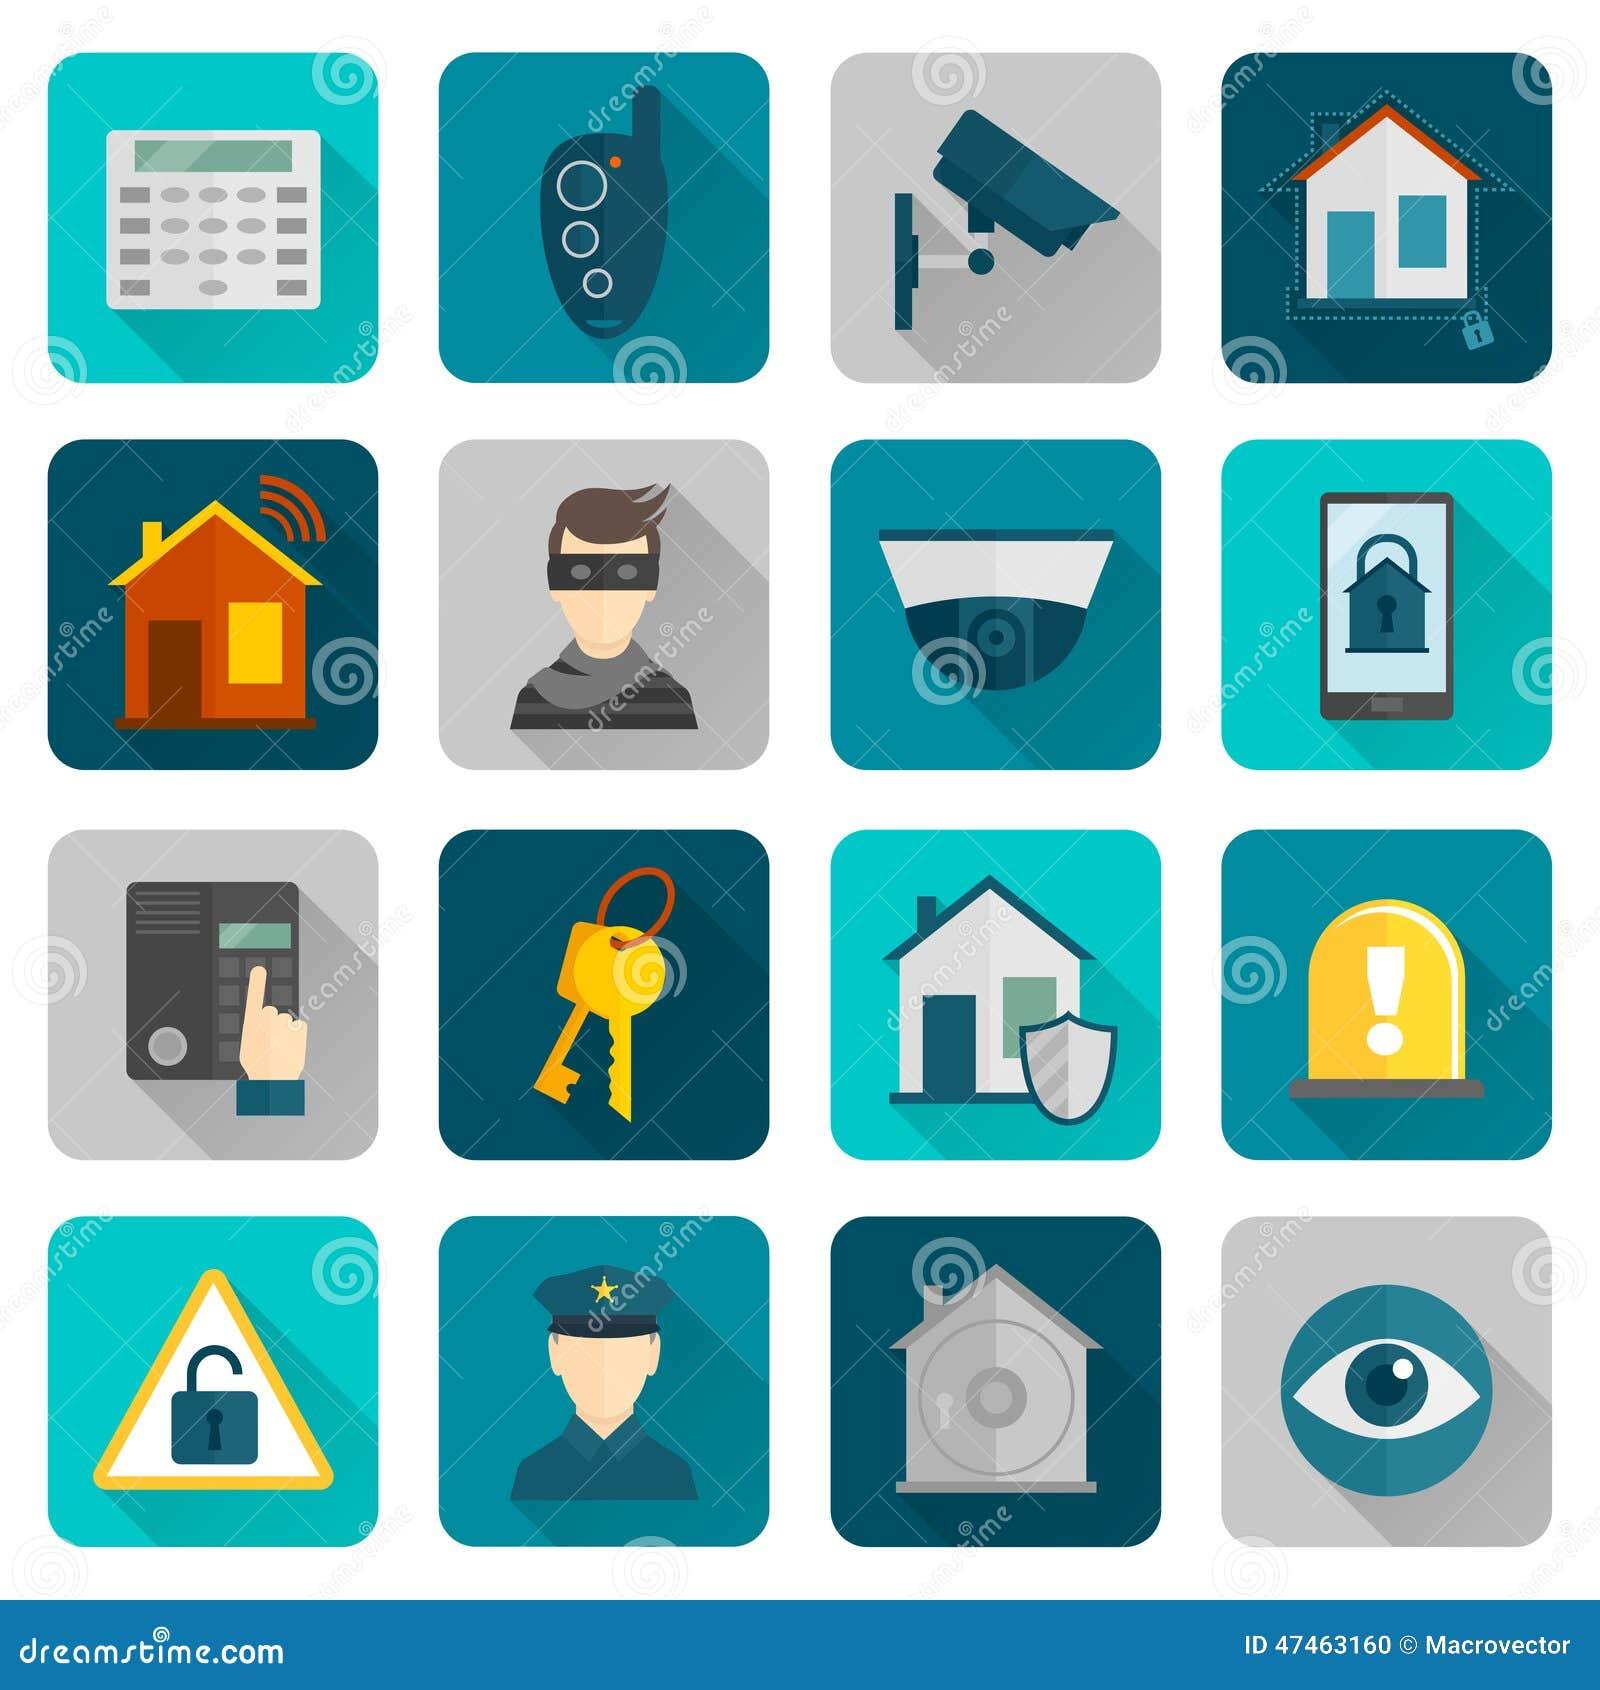 Home Security Camera System Set Of 2